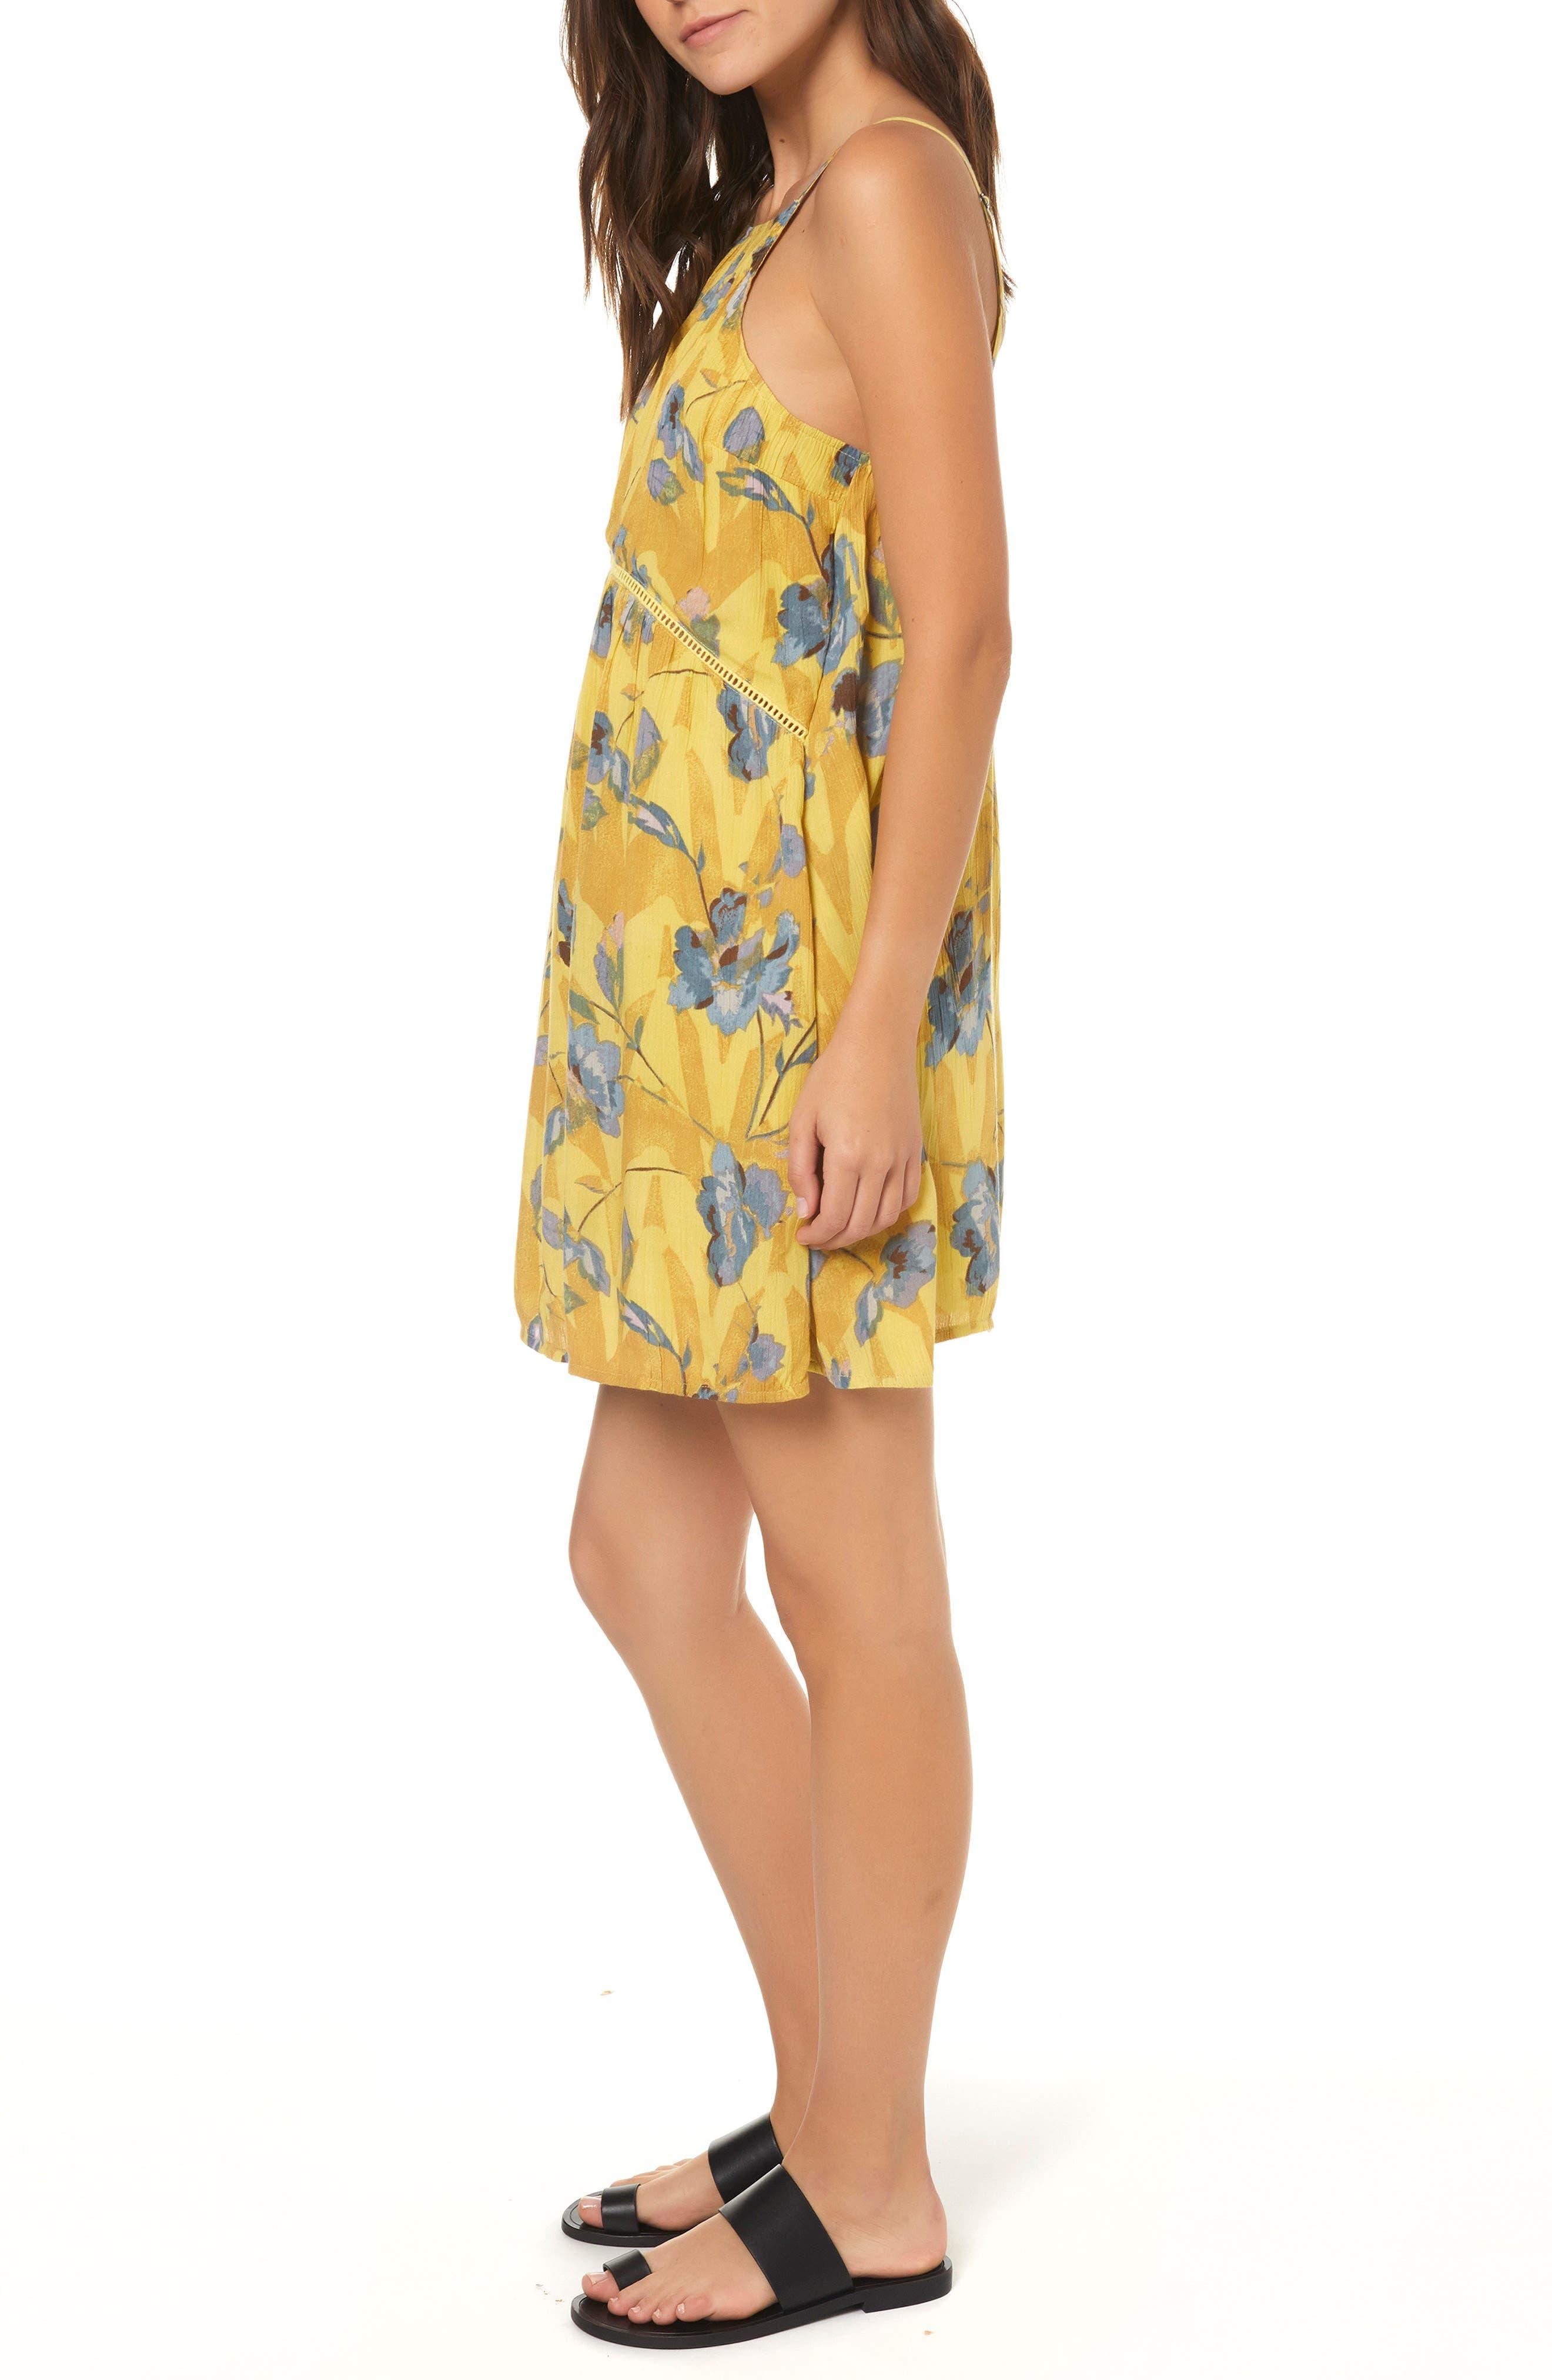 Henna Floral Print Woven Tank Dress,                             Alternate thumbnail 3, color,                             MULTI COLORED